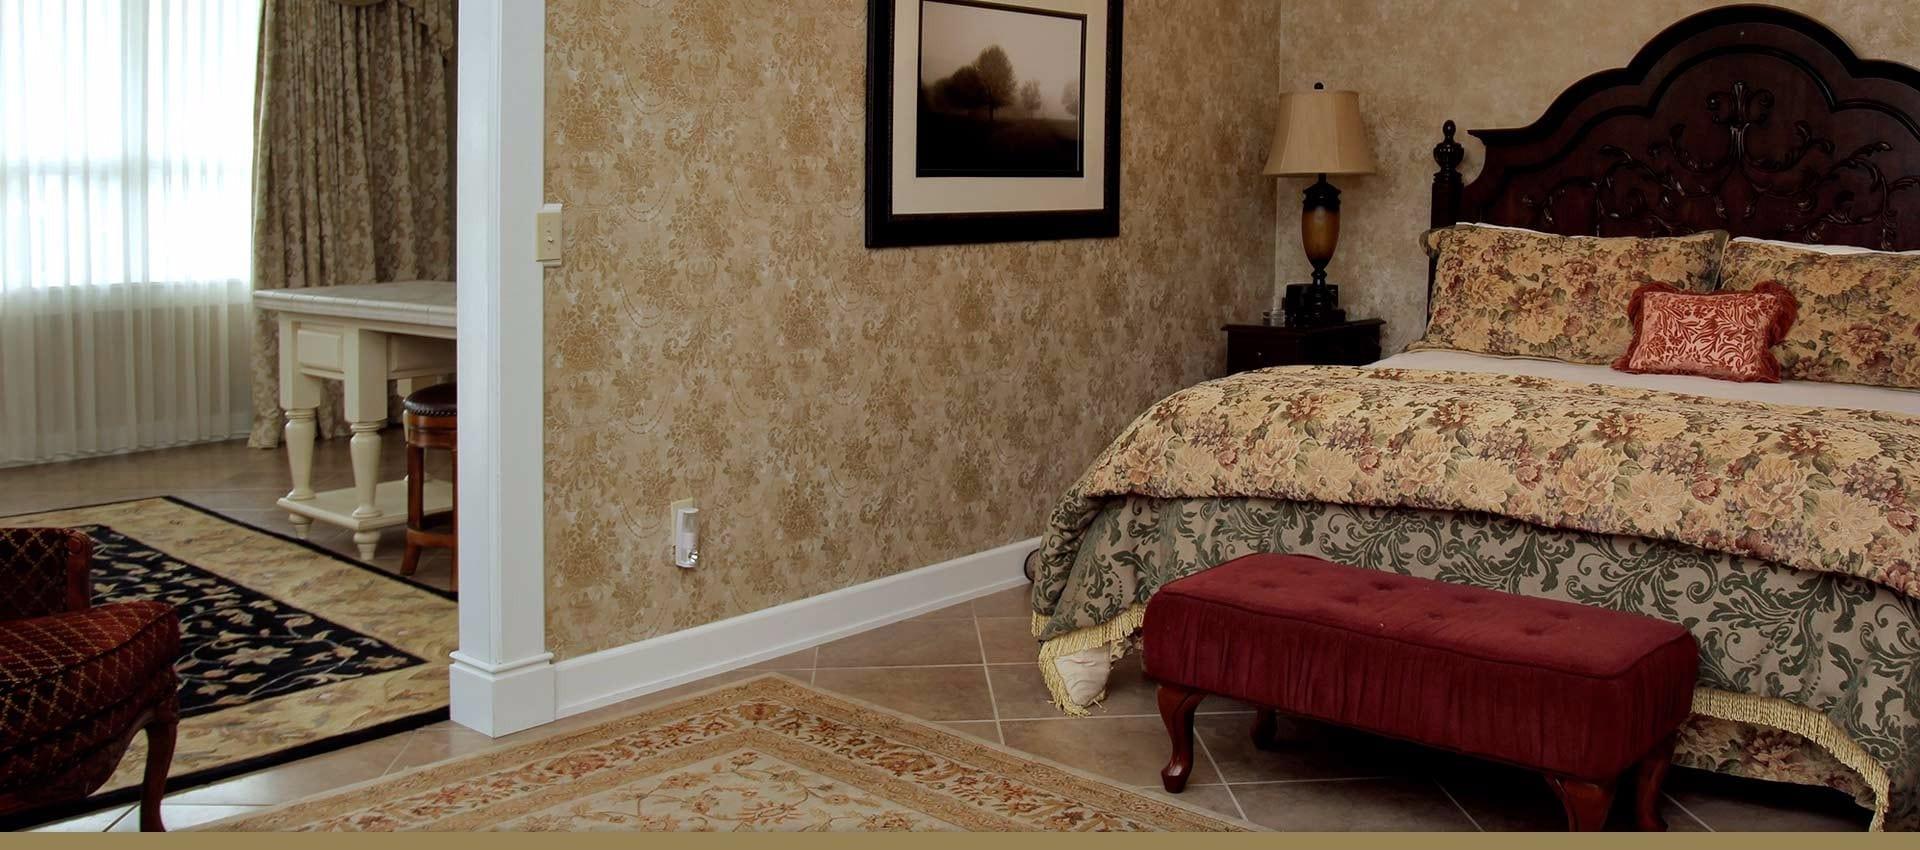 Victorian Village Inn Anna's Suite bedroom